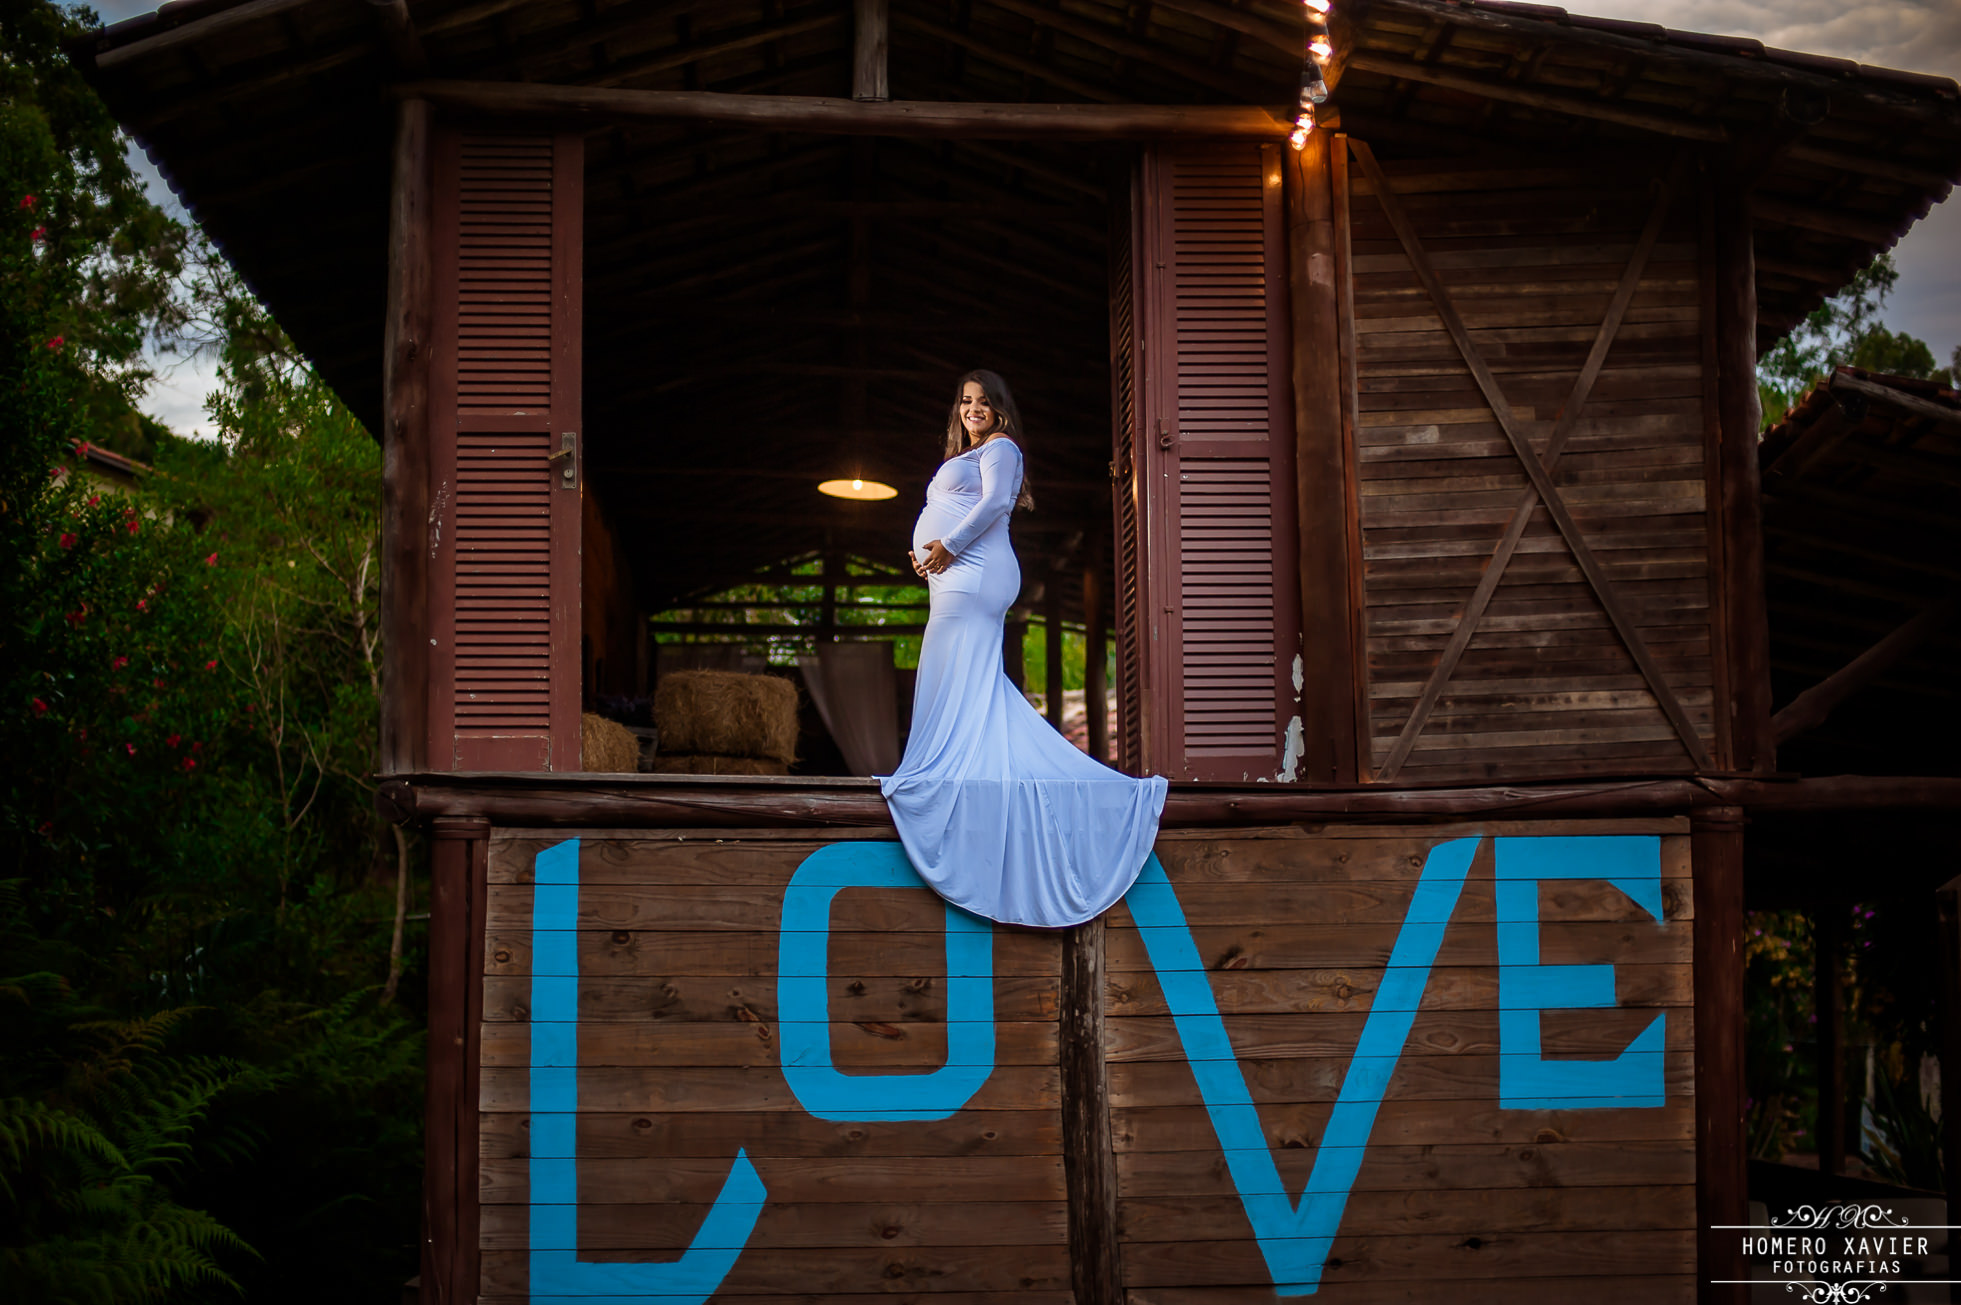 ensaio fotográfico book de gestante no Bougainville Farm em Caeté